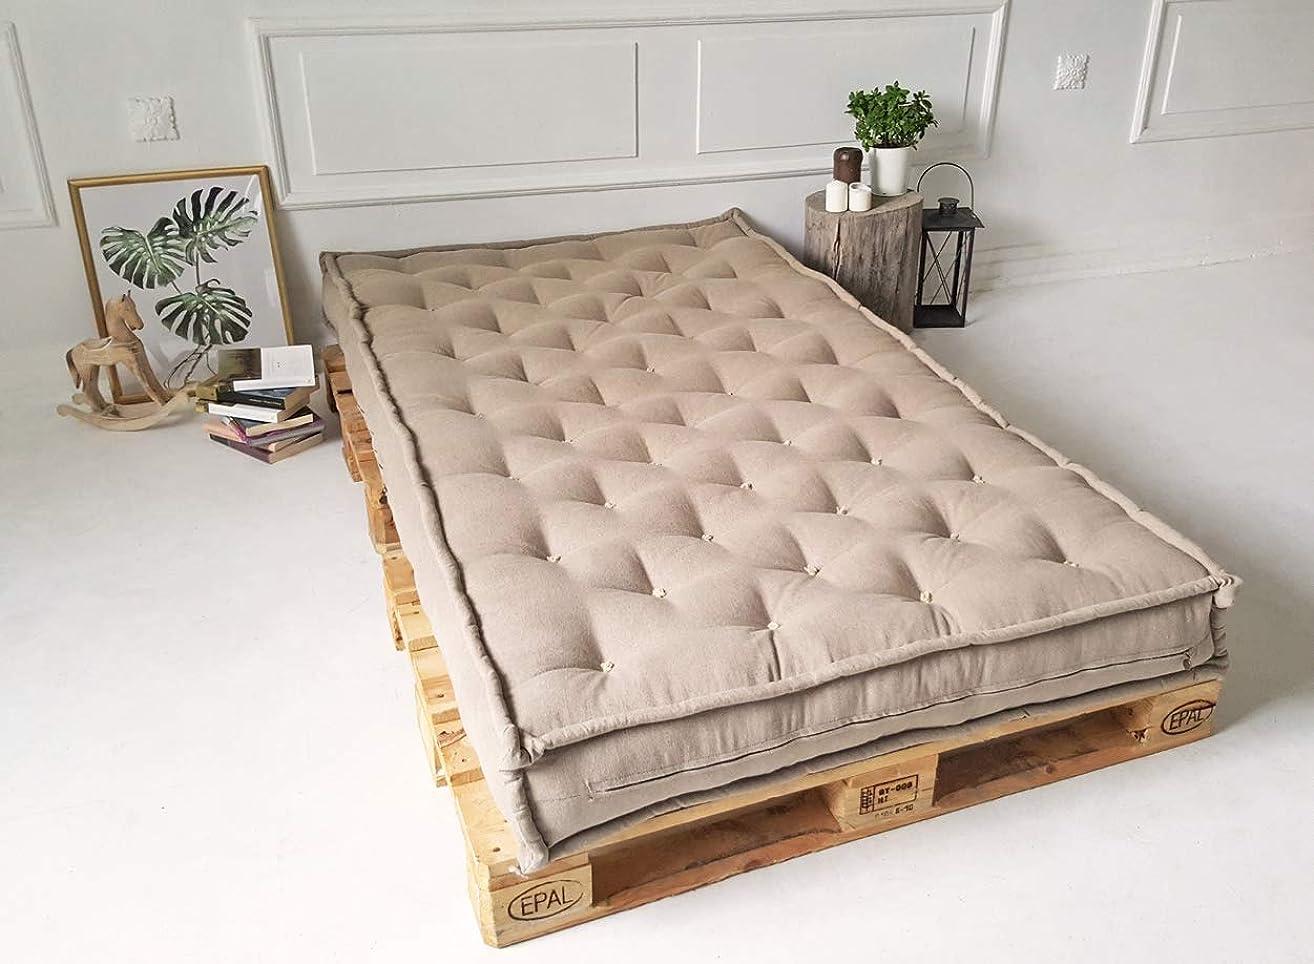 Wool Mattress/Custom Sizes, Shapes & Fabrics Available